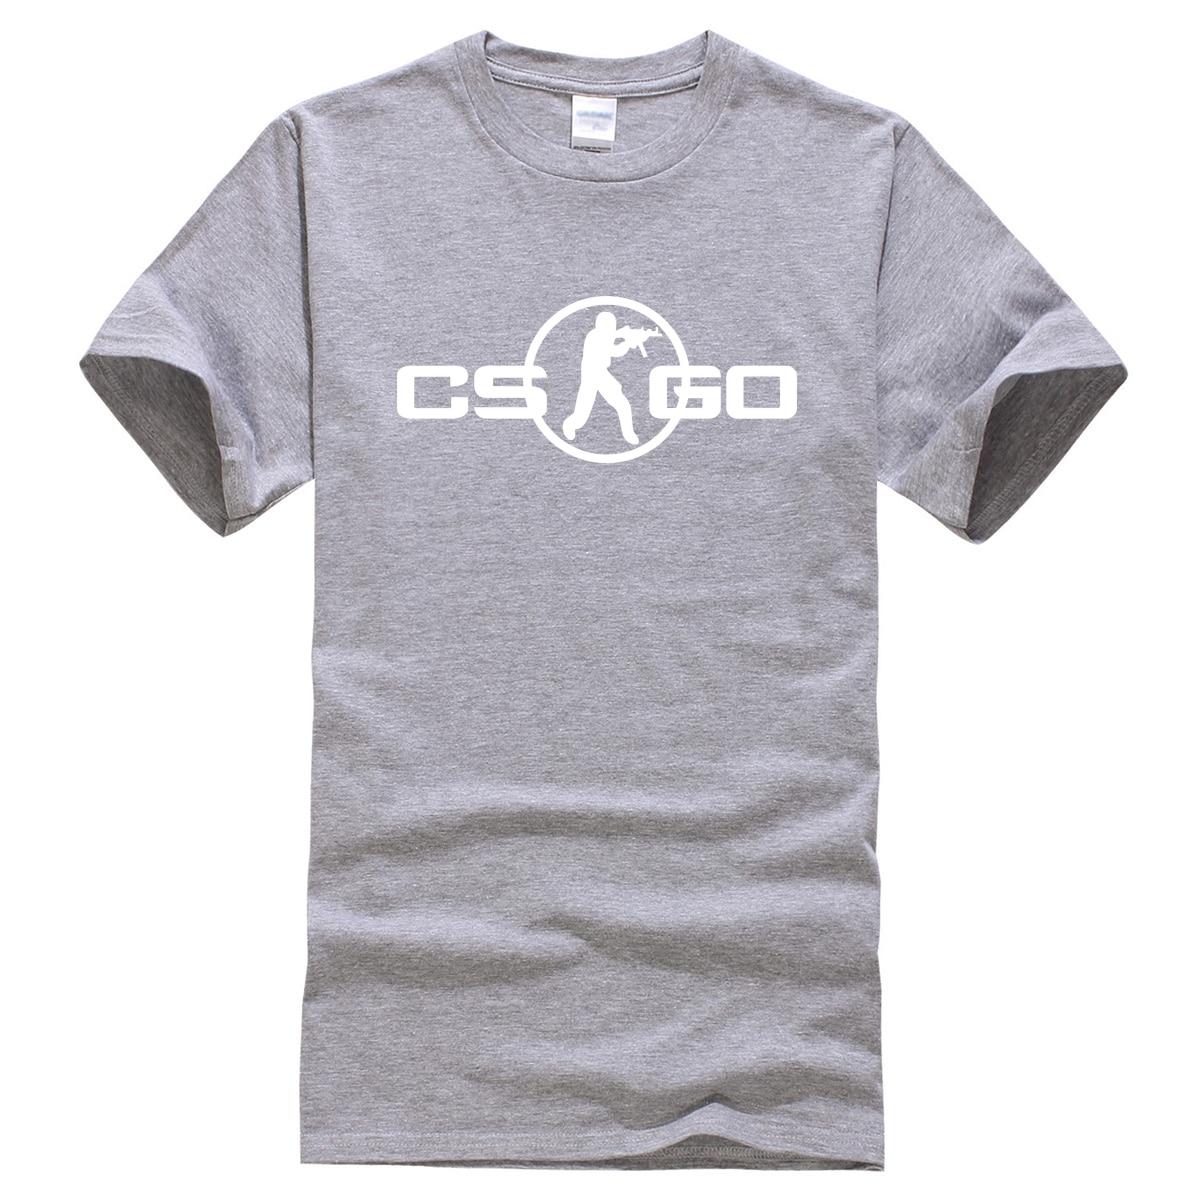 2019 Spring Summer Hot Sale New Arrival T Shirt Men Game CS GO Cosplay Fashion Cotton T-shirt Harajuku Top Tees Fitness T-shirts